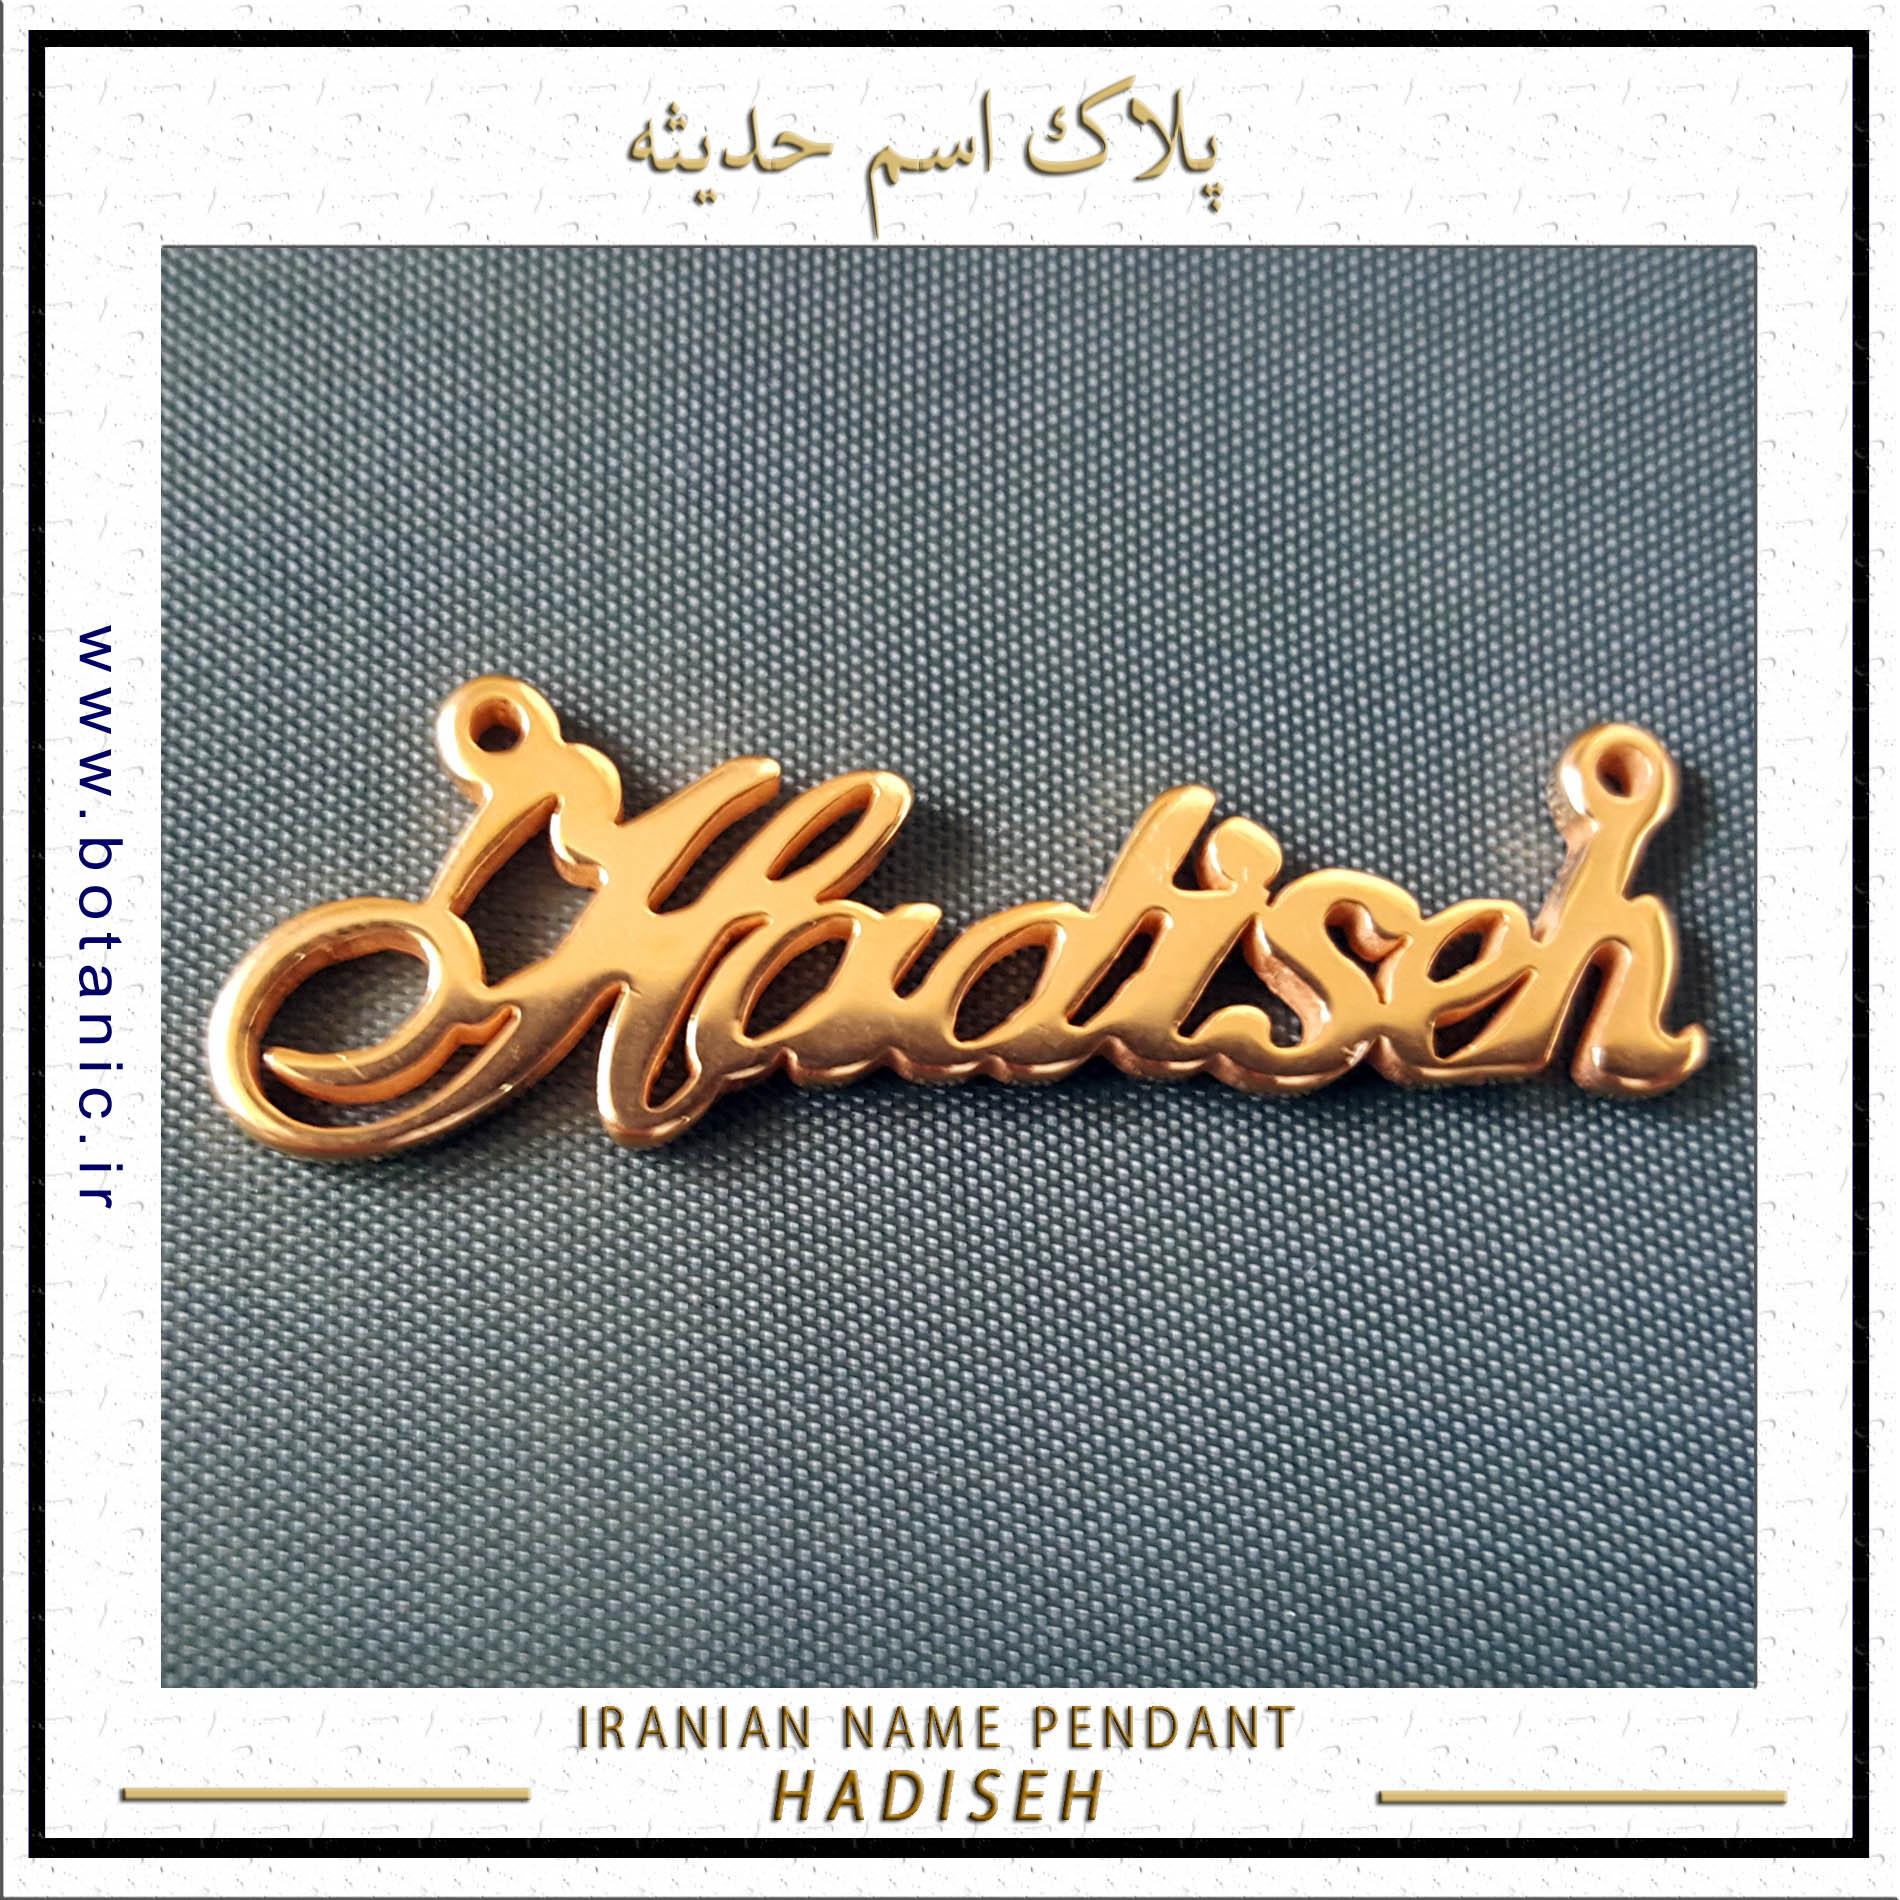 Iranian Name Pendant Hadiseh